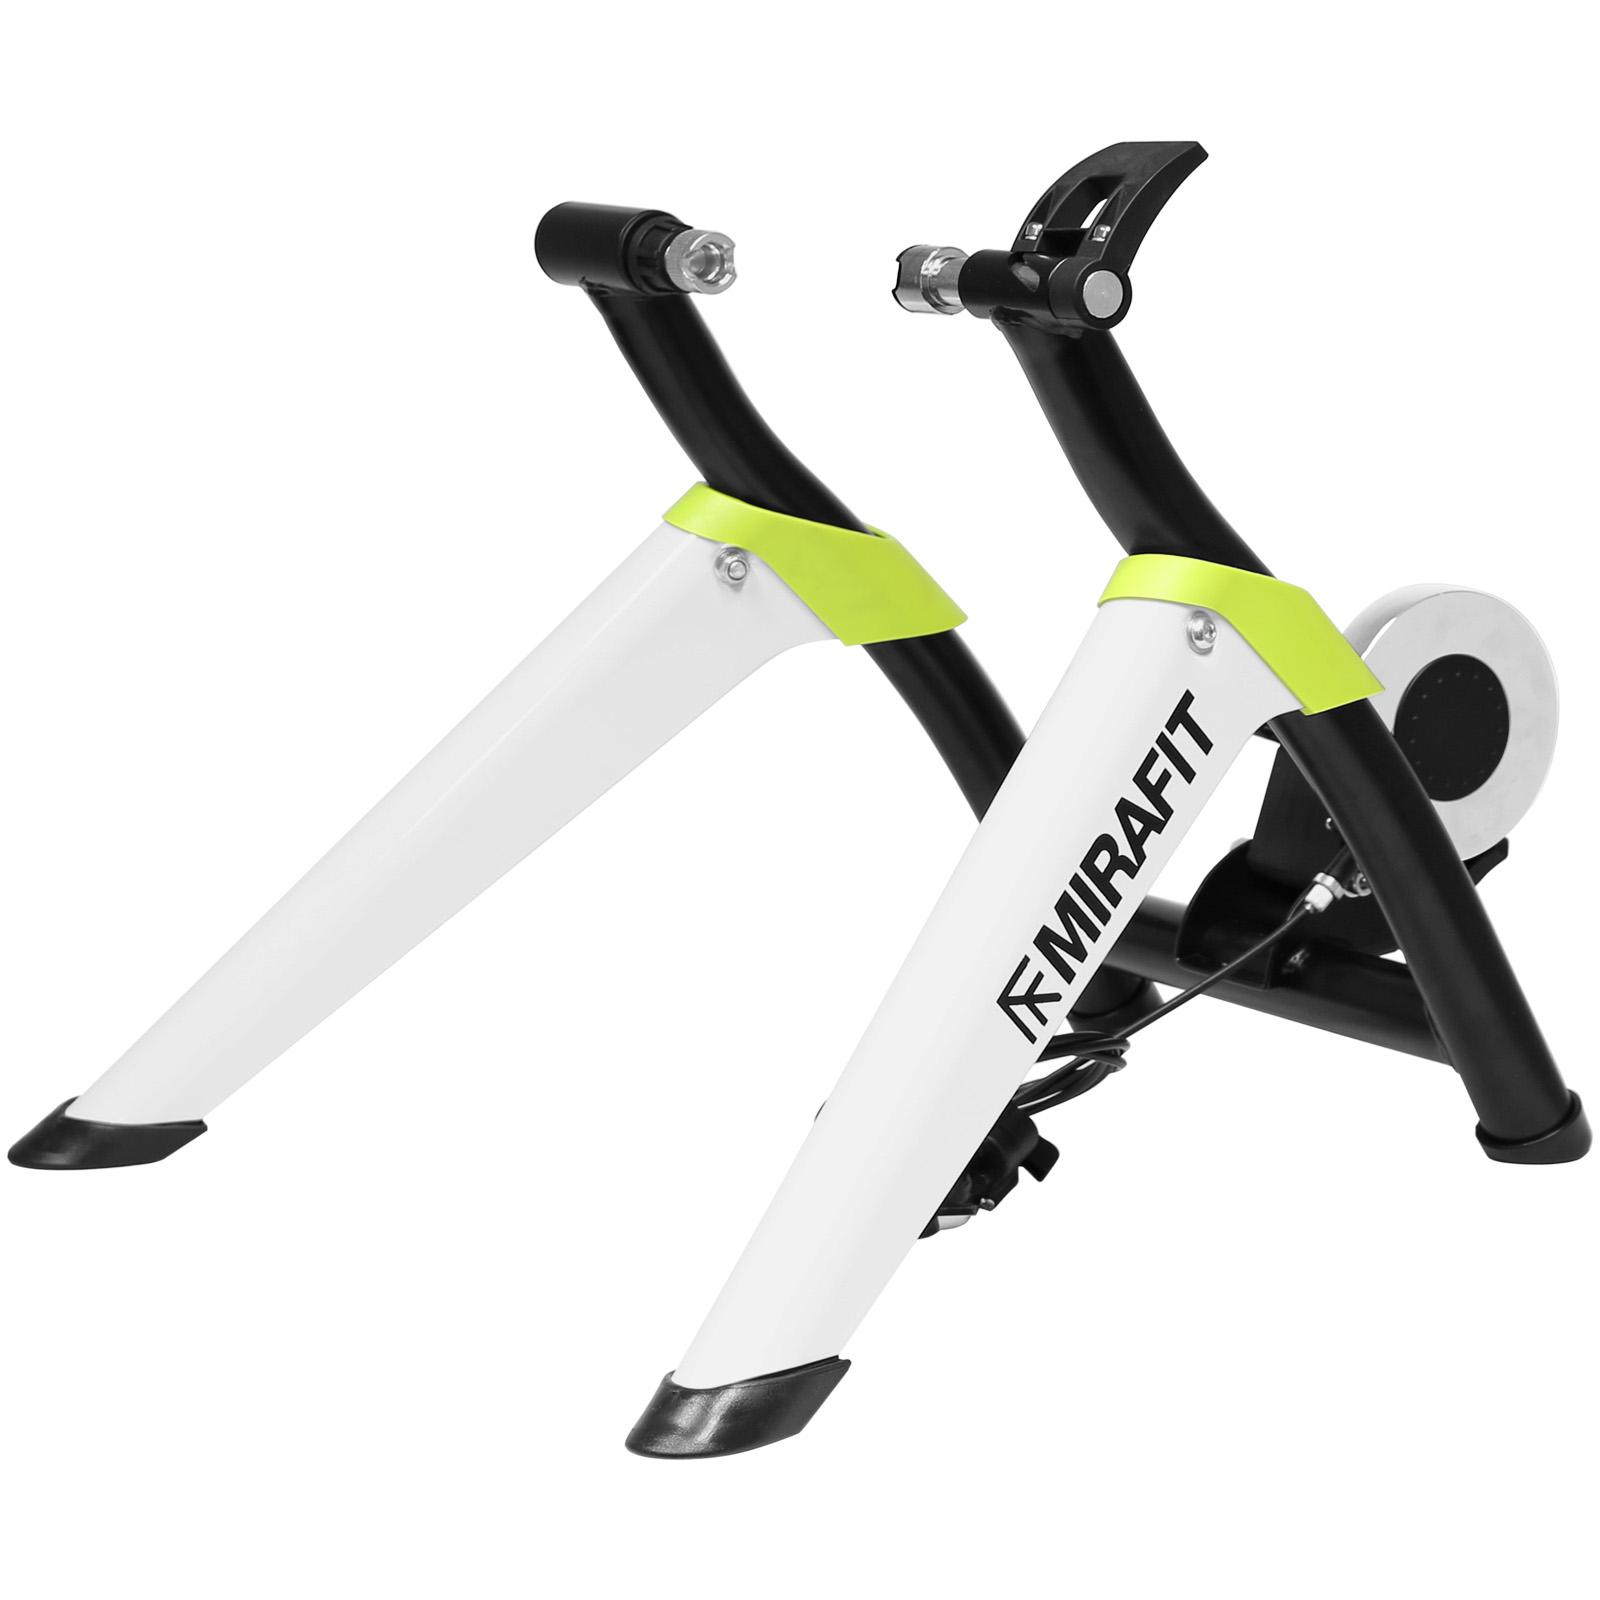 MIRAFIT 8 Speed Adjustable Bicycle Turbo Trainer Triathlon